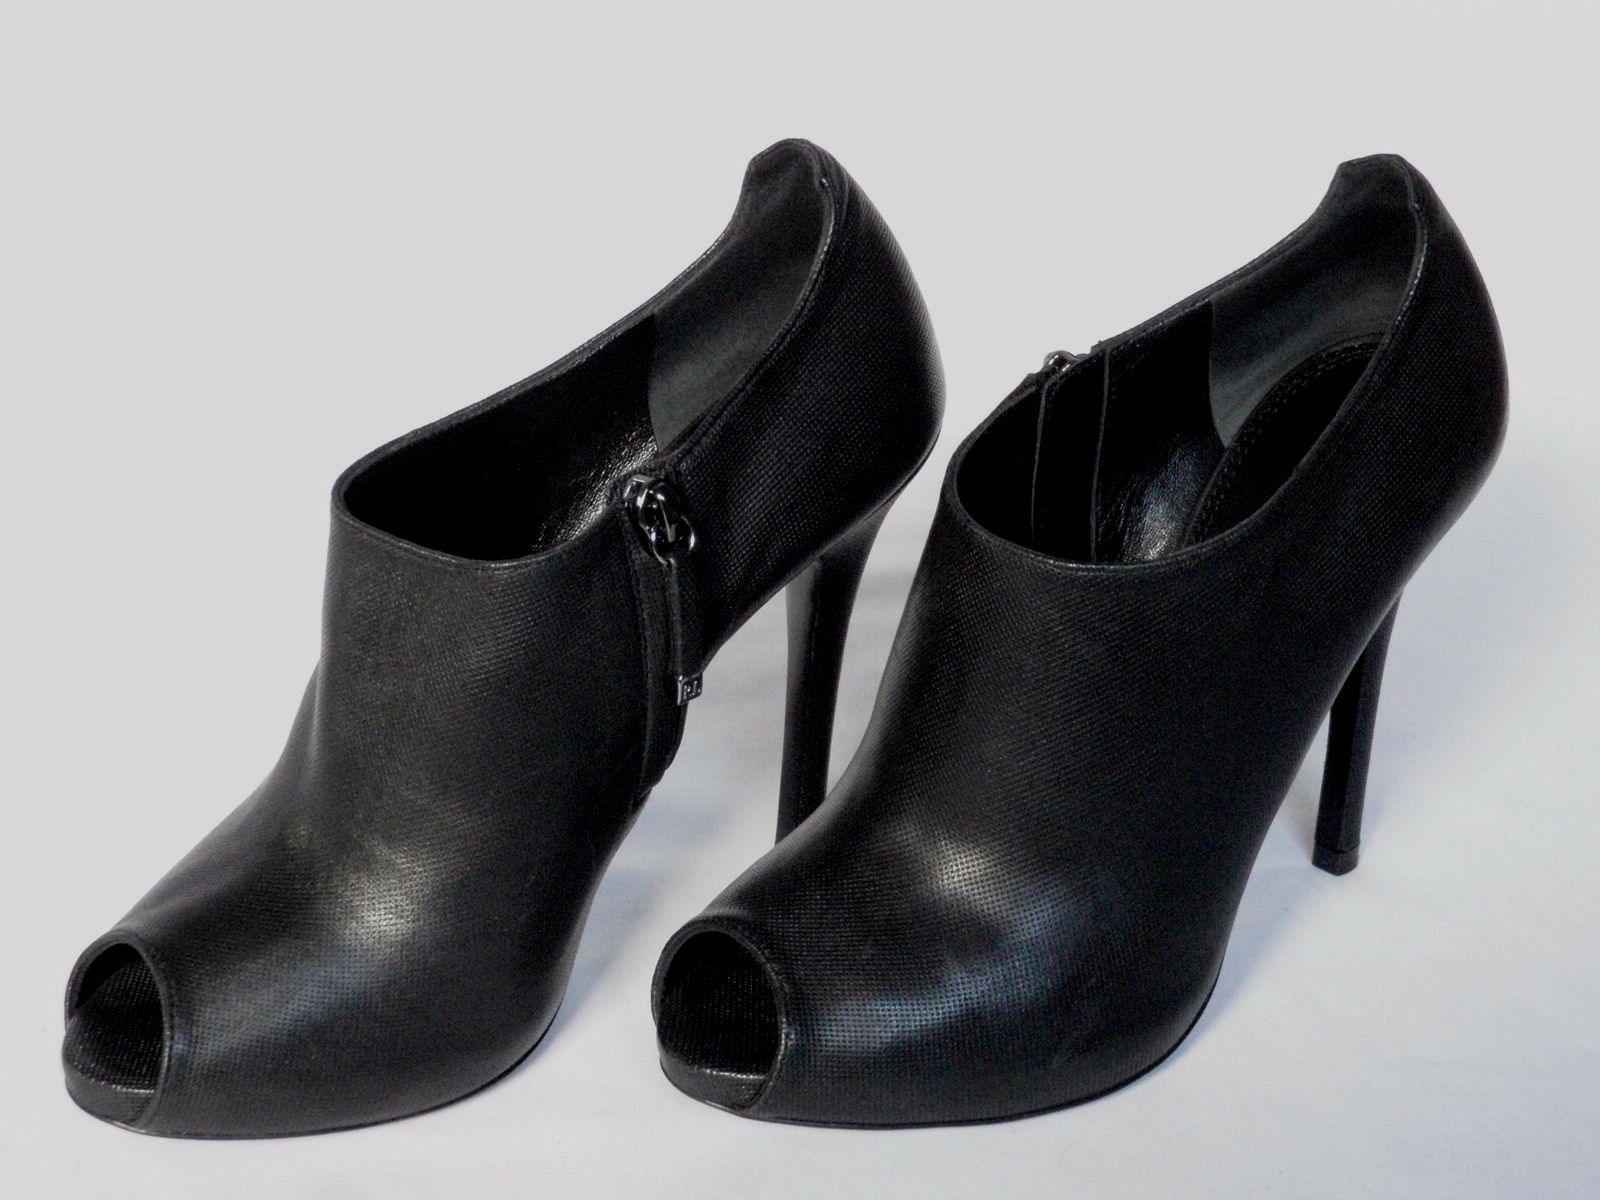 NUOVO Donna Ralph Lauren Scarpa in pelle nera Jassie Boot EU 38 US 8